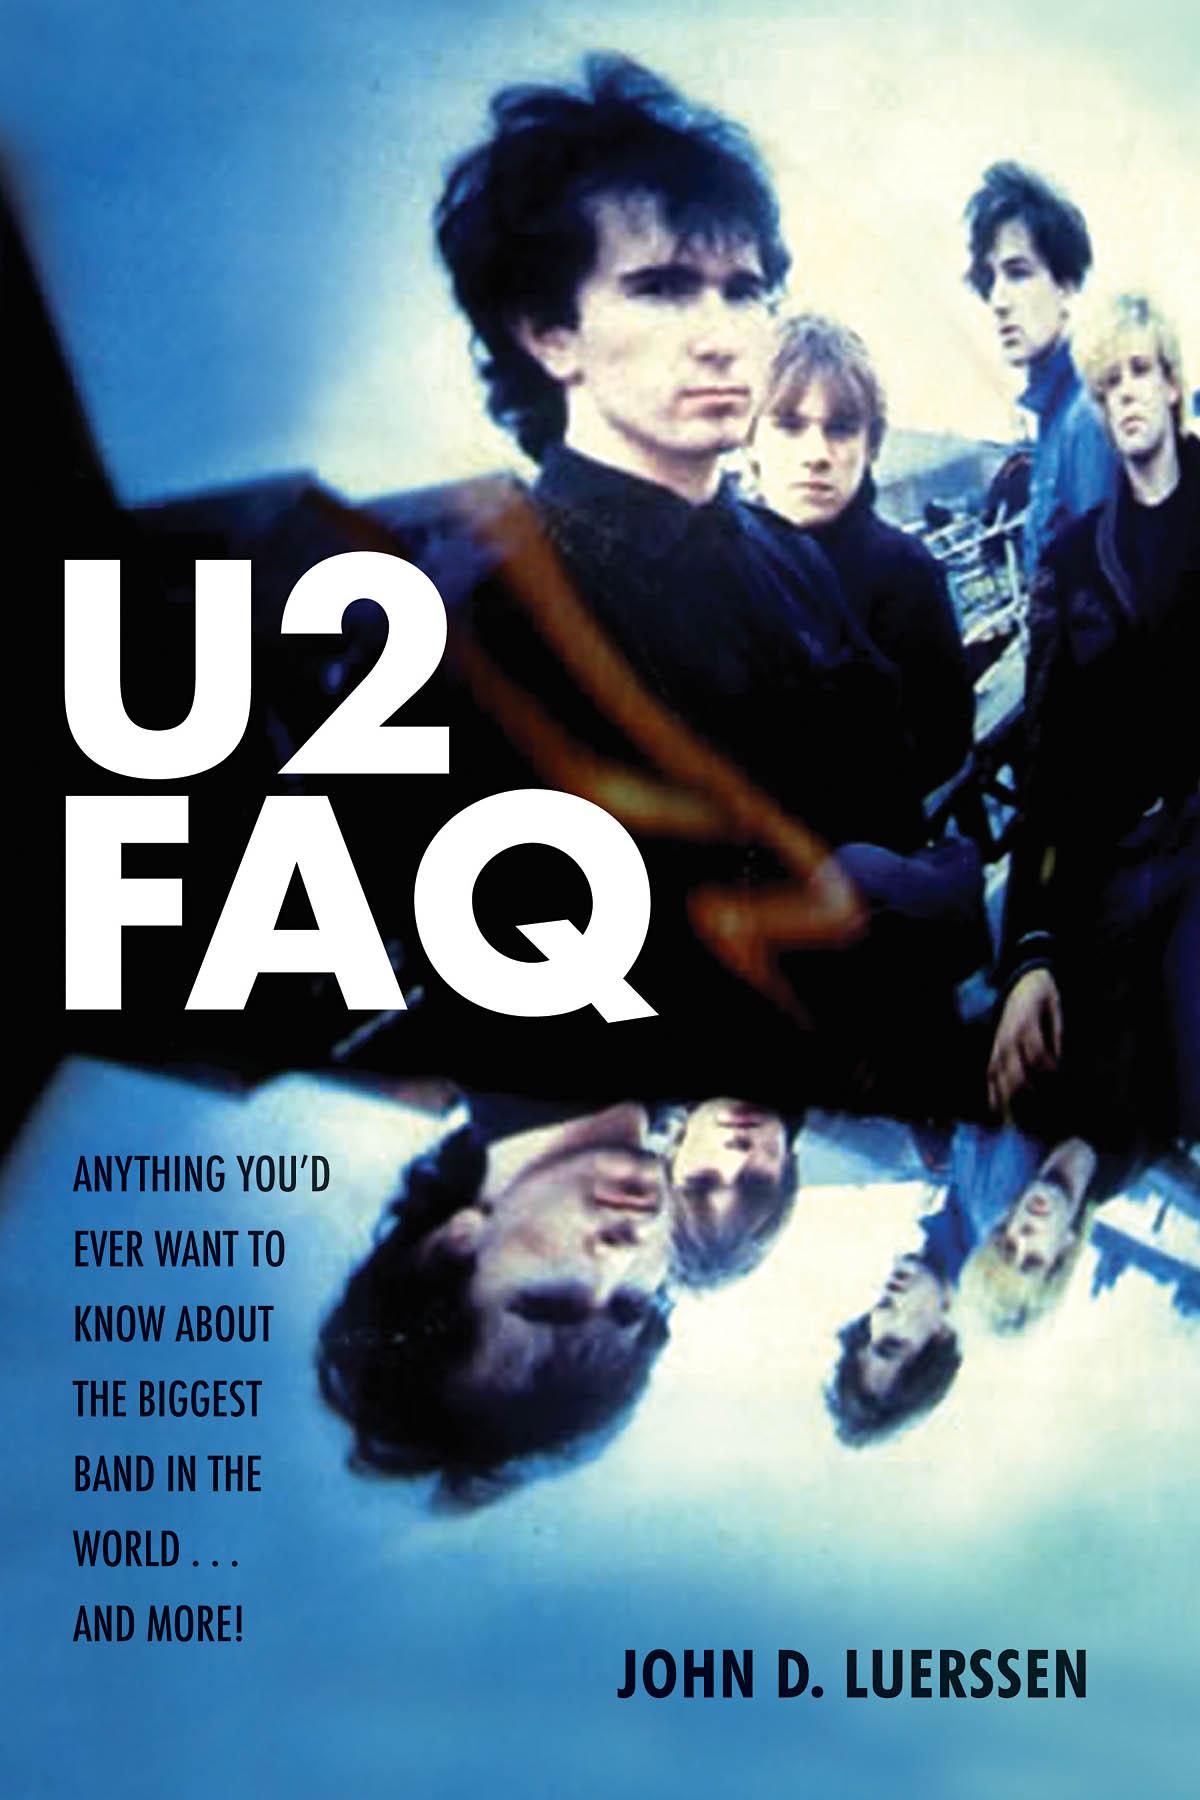 U2 Faq: Reference Books